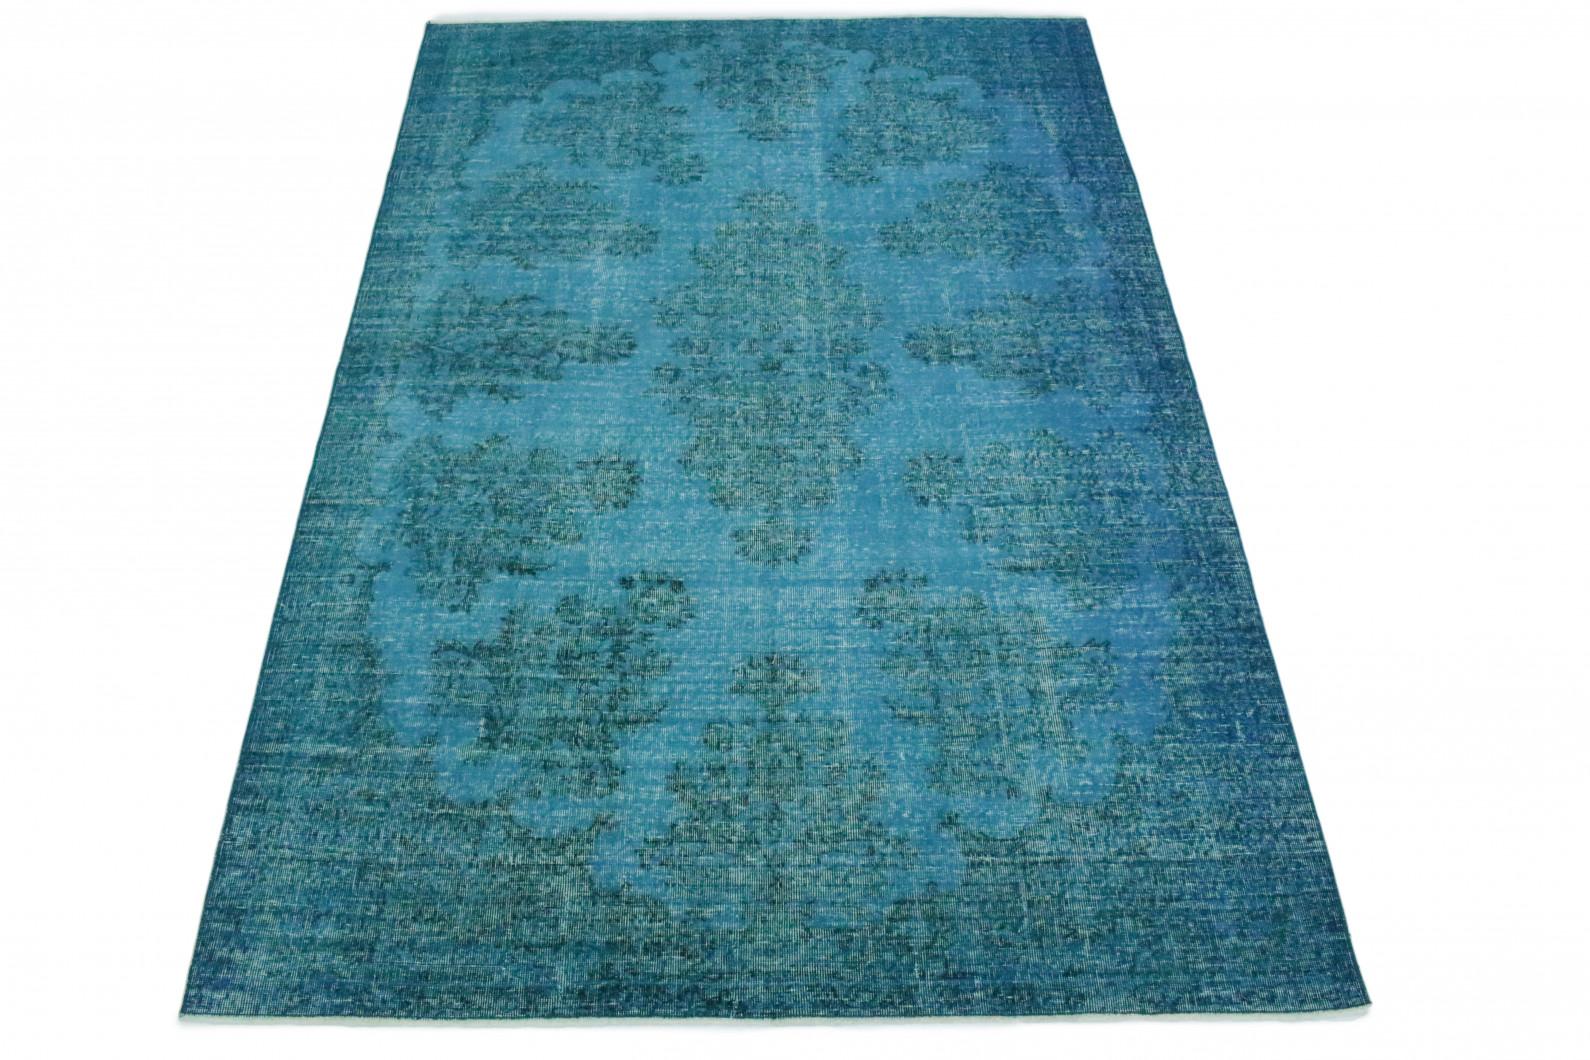 vintage teppich t rkis in 290x200 1011 1293 bei kaufen. Black Bedroom Furniture Sets. Home Design Ideas